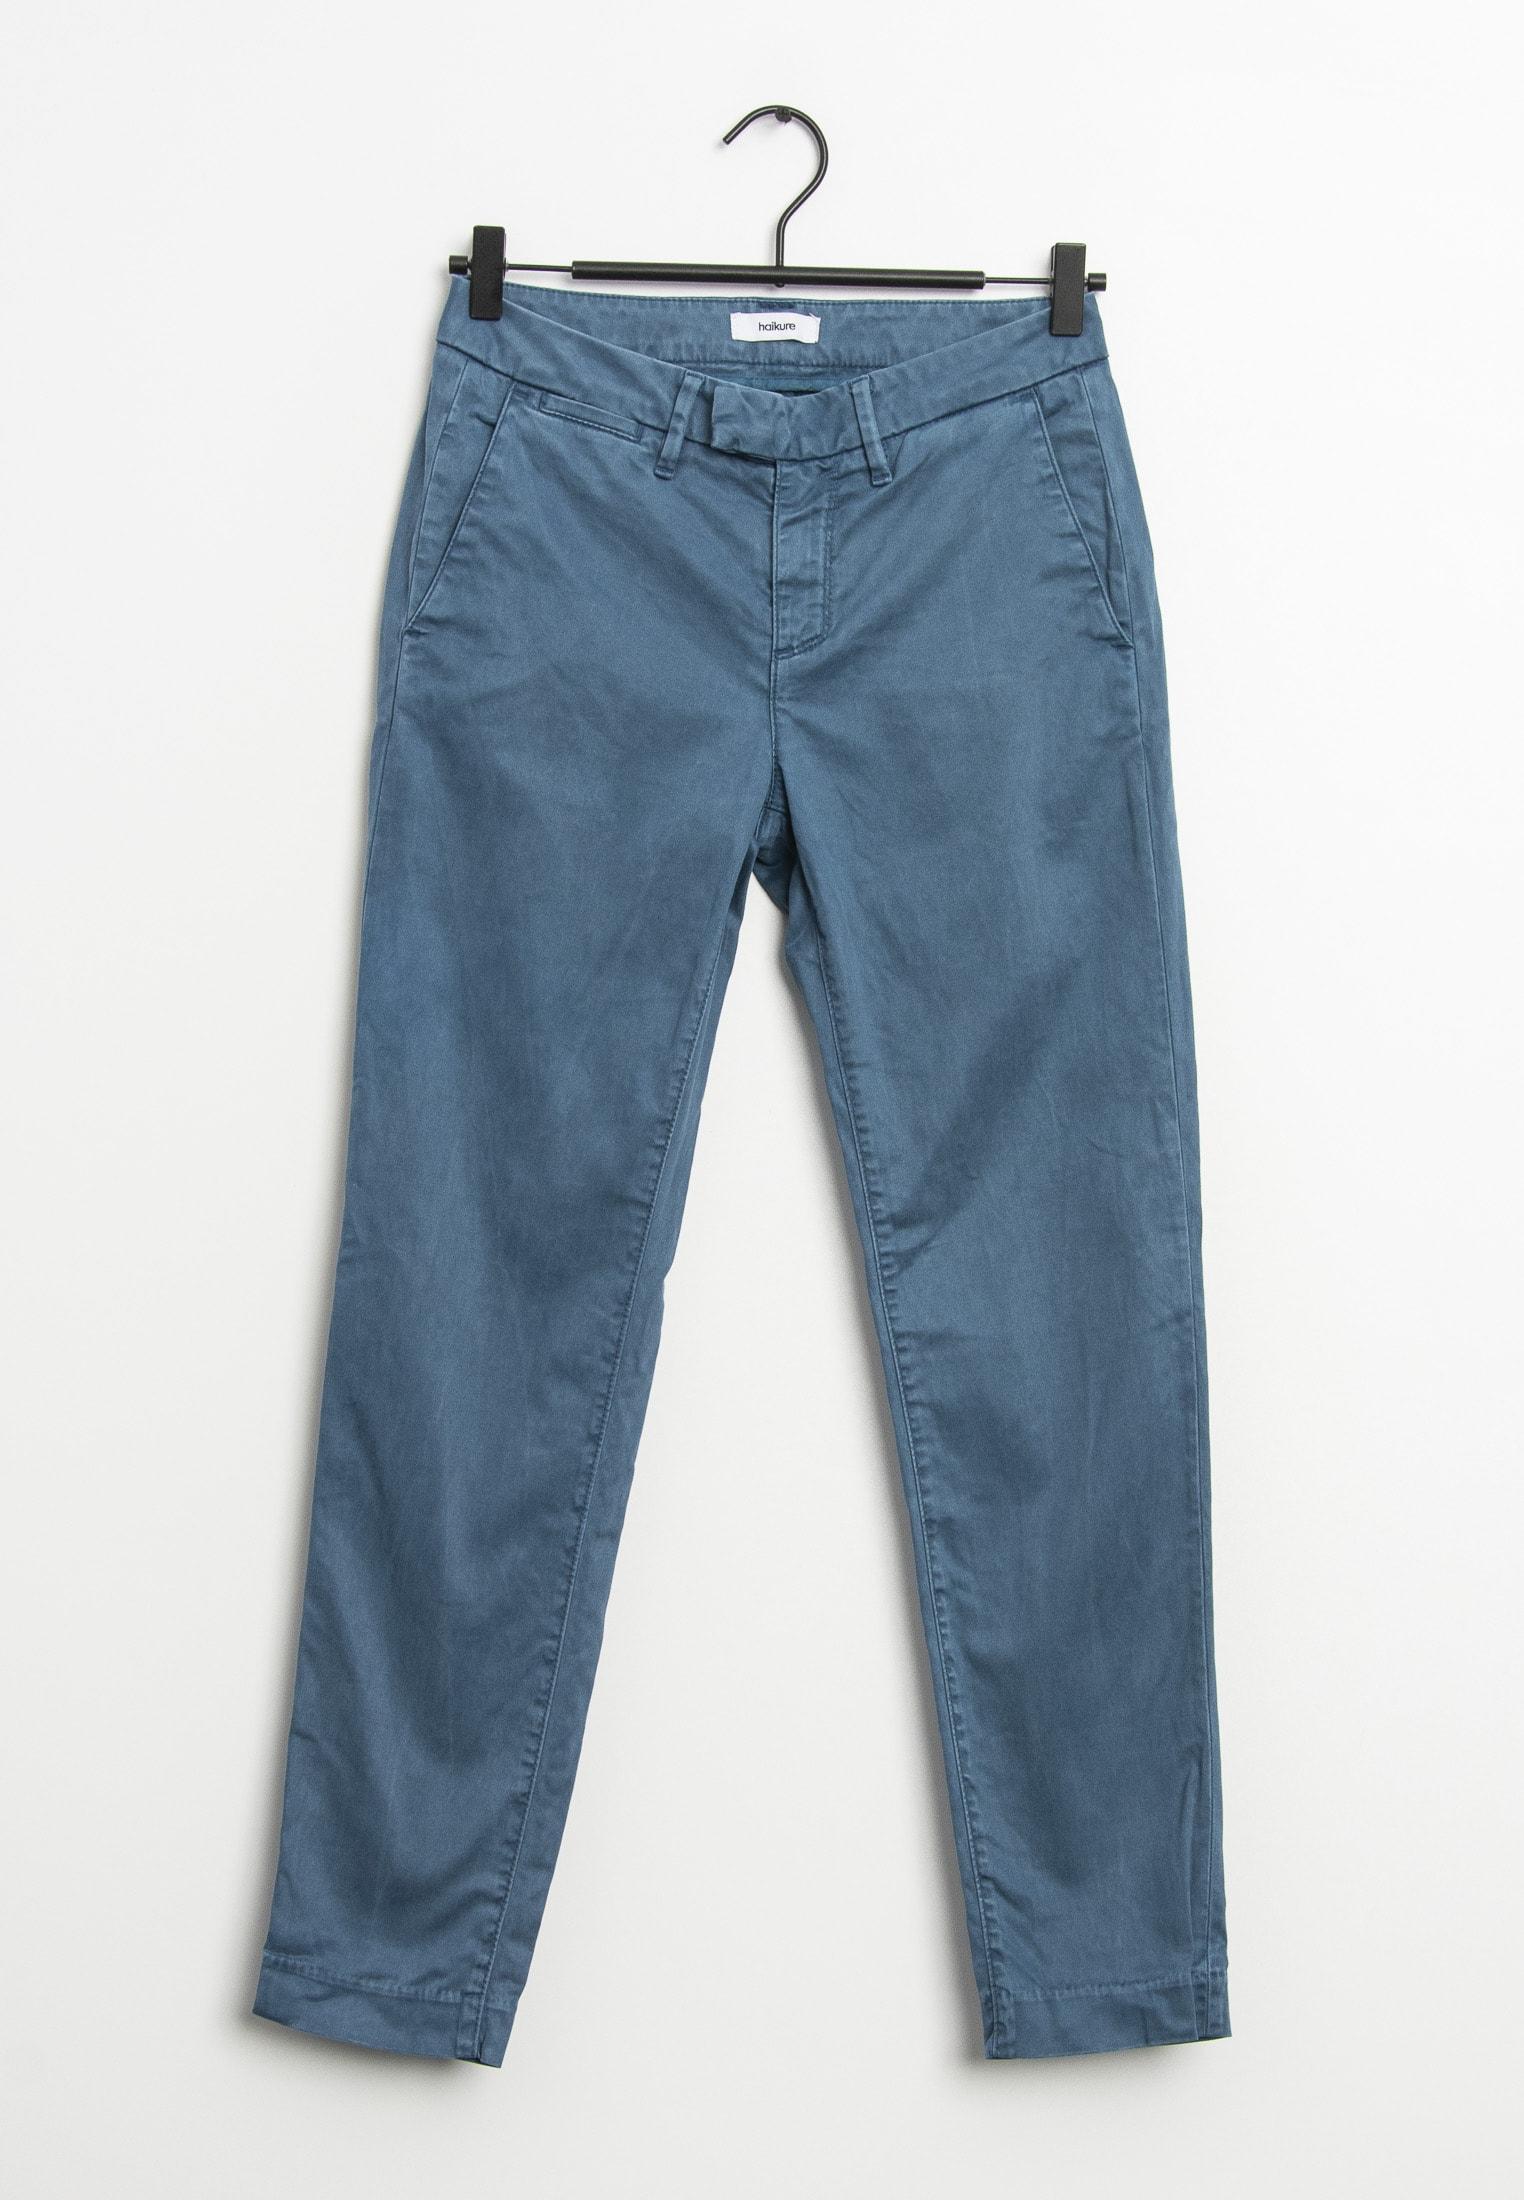 Haikure Jeans Blau Gr.W26 L32